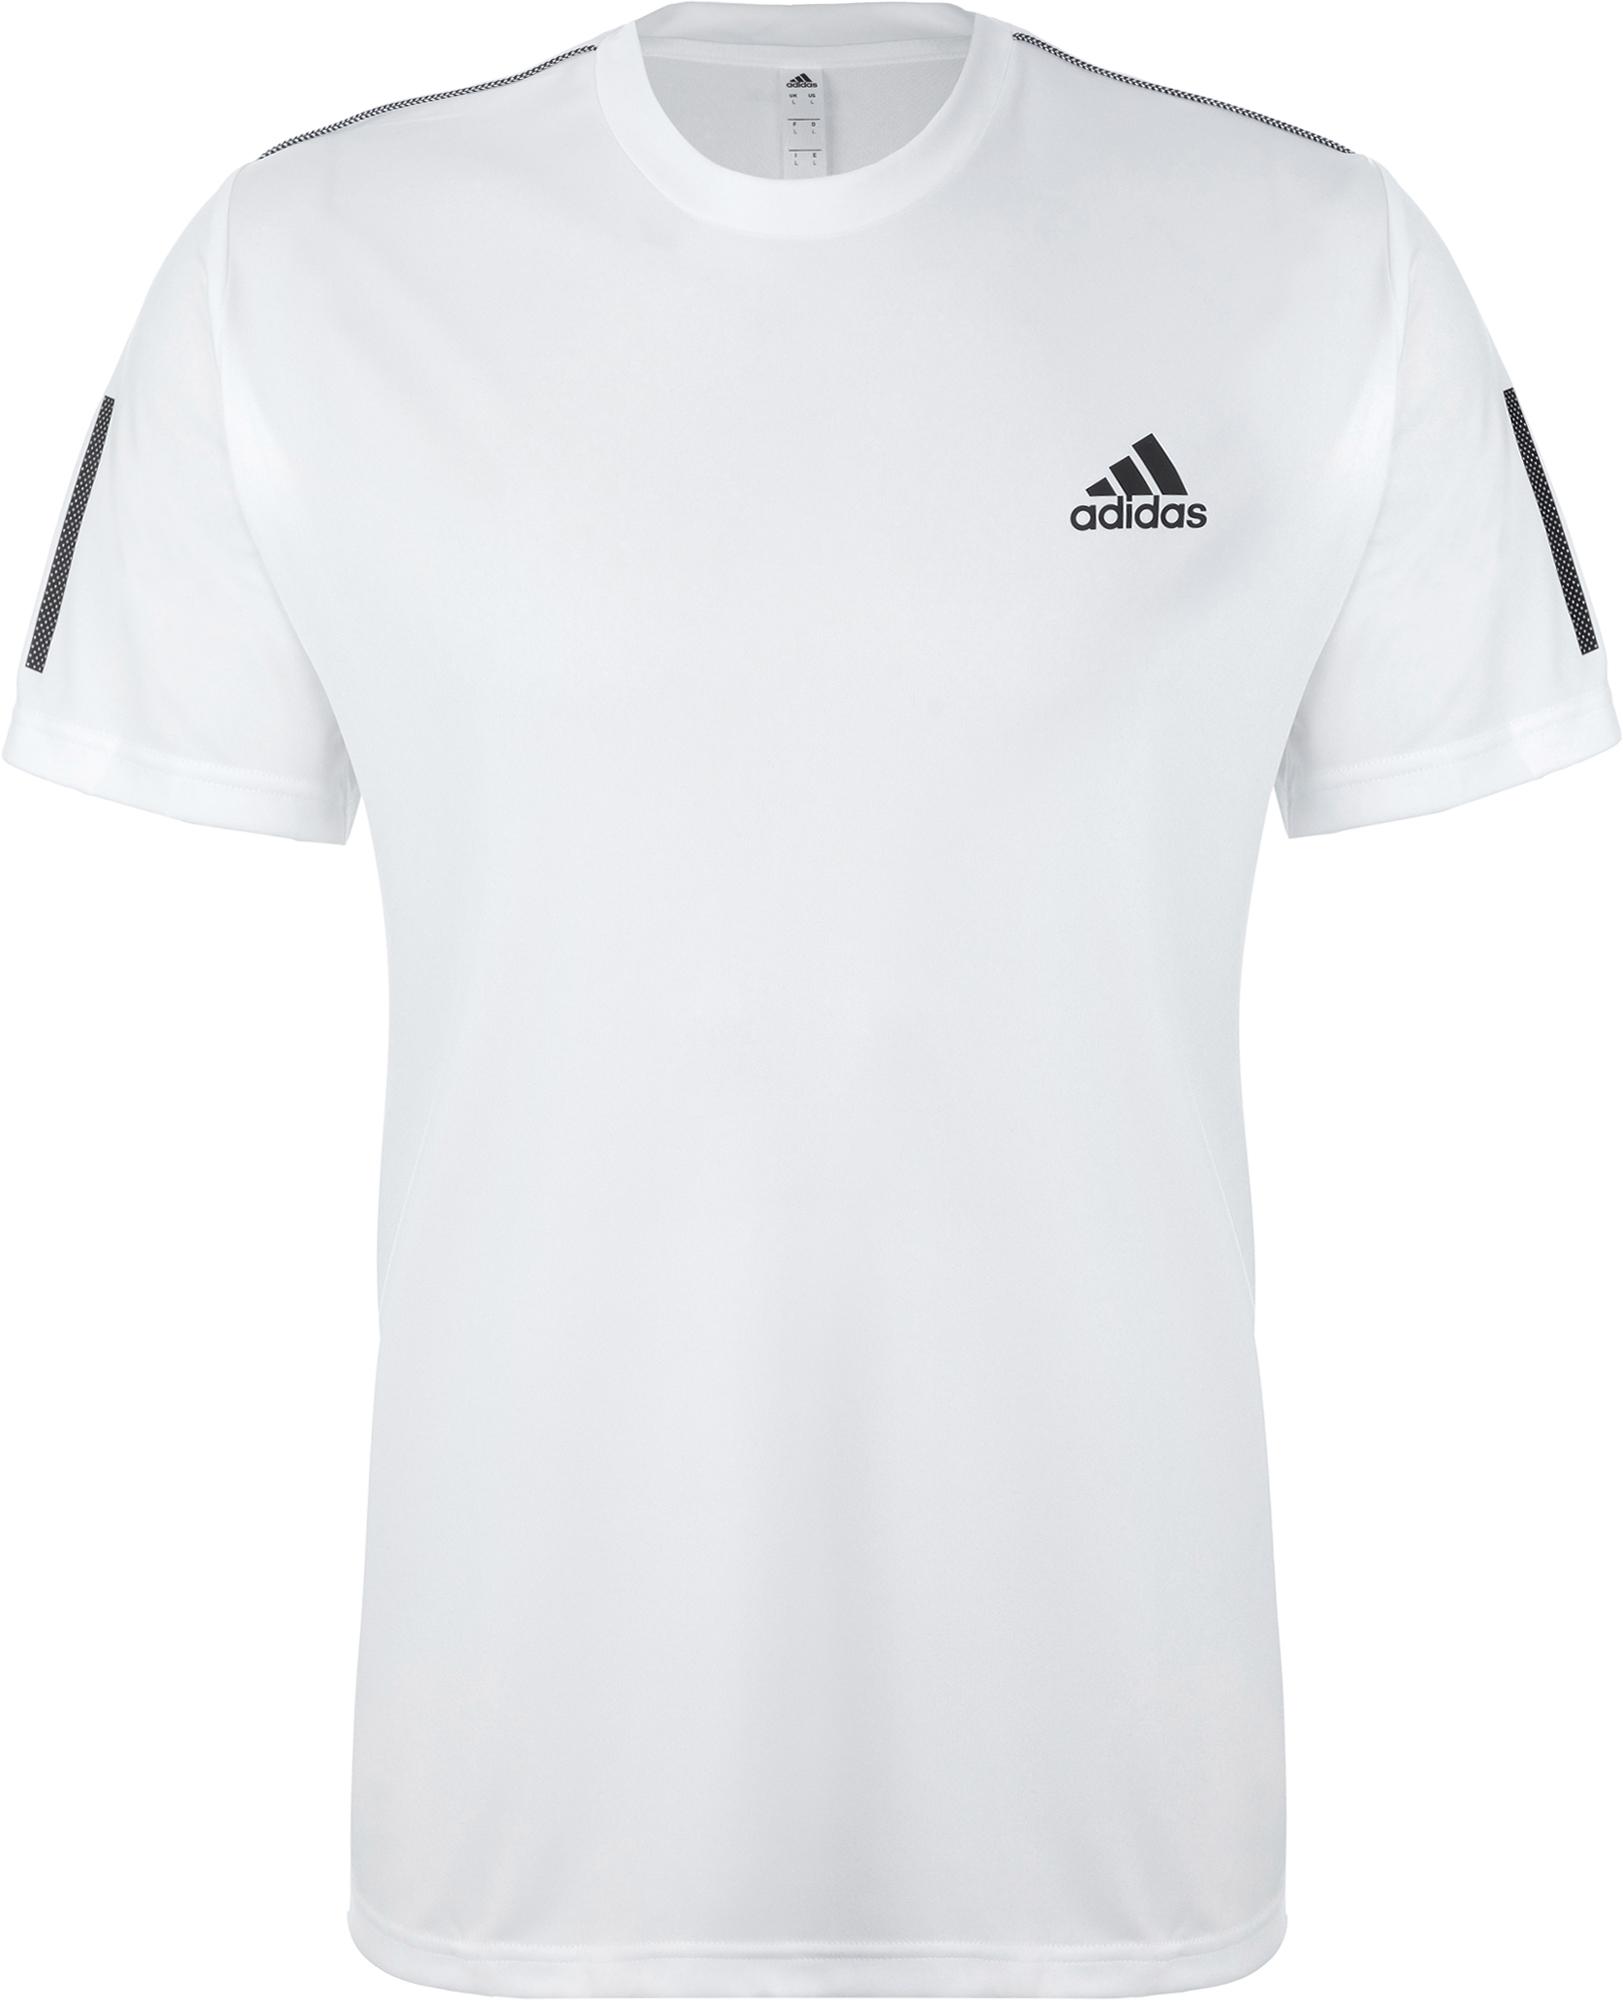 лучшая цена Adidas Футболка мужская Adidas 3-Stripes Club, размер L